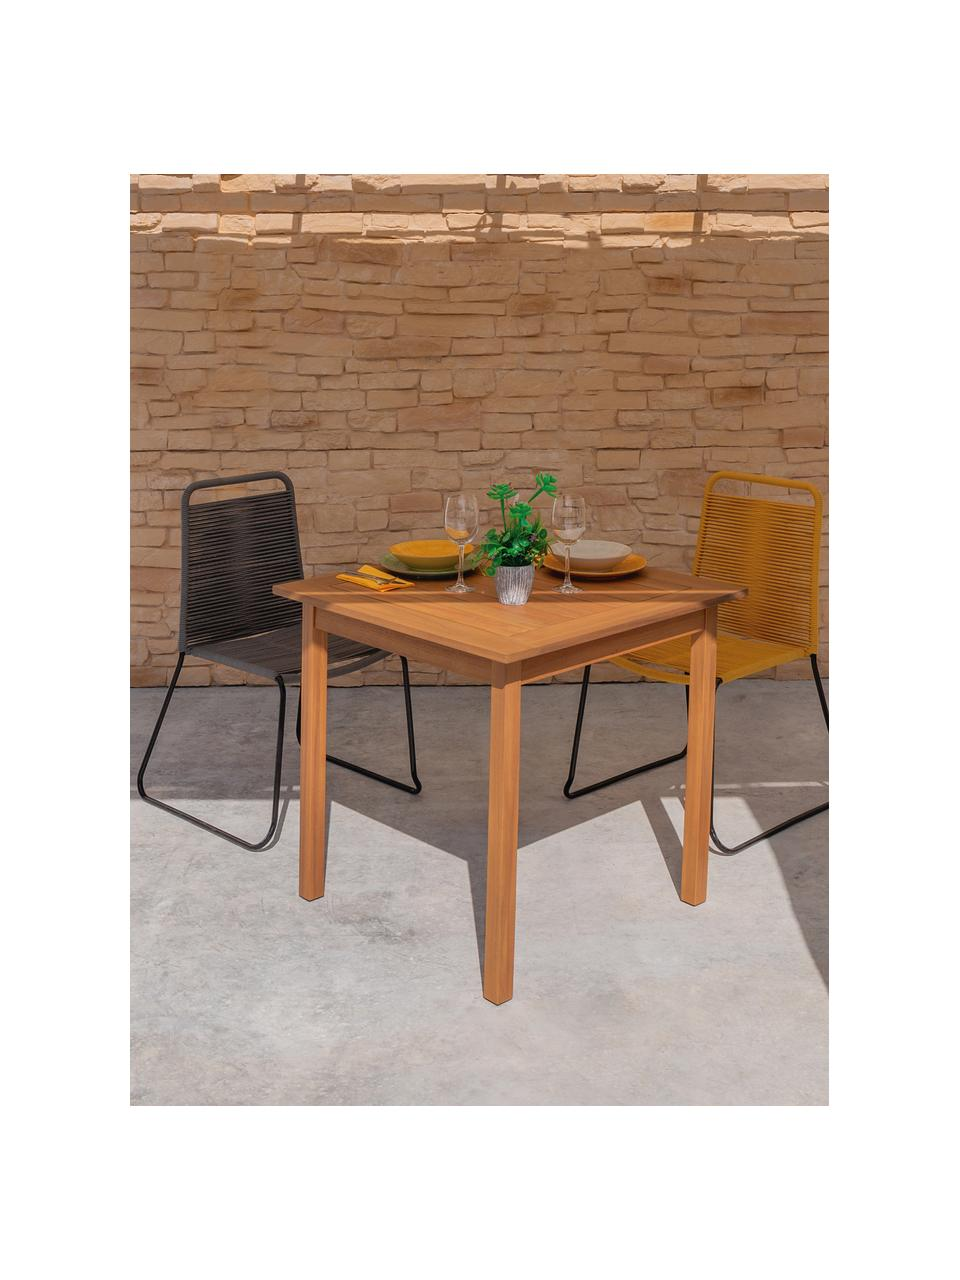 Krzesło ogrodowe  Suture, 2 szt., Nogi: stal szlachetna , lakiero, Szary, S 53 x G 53 cm